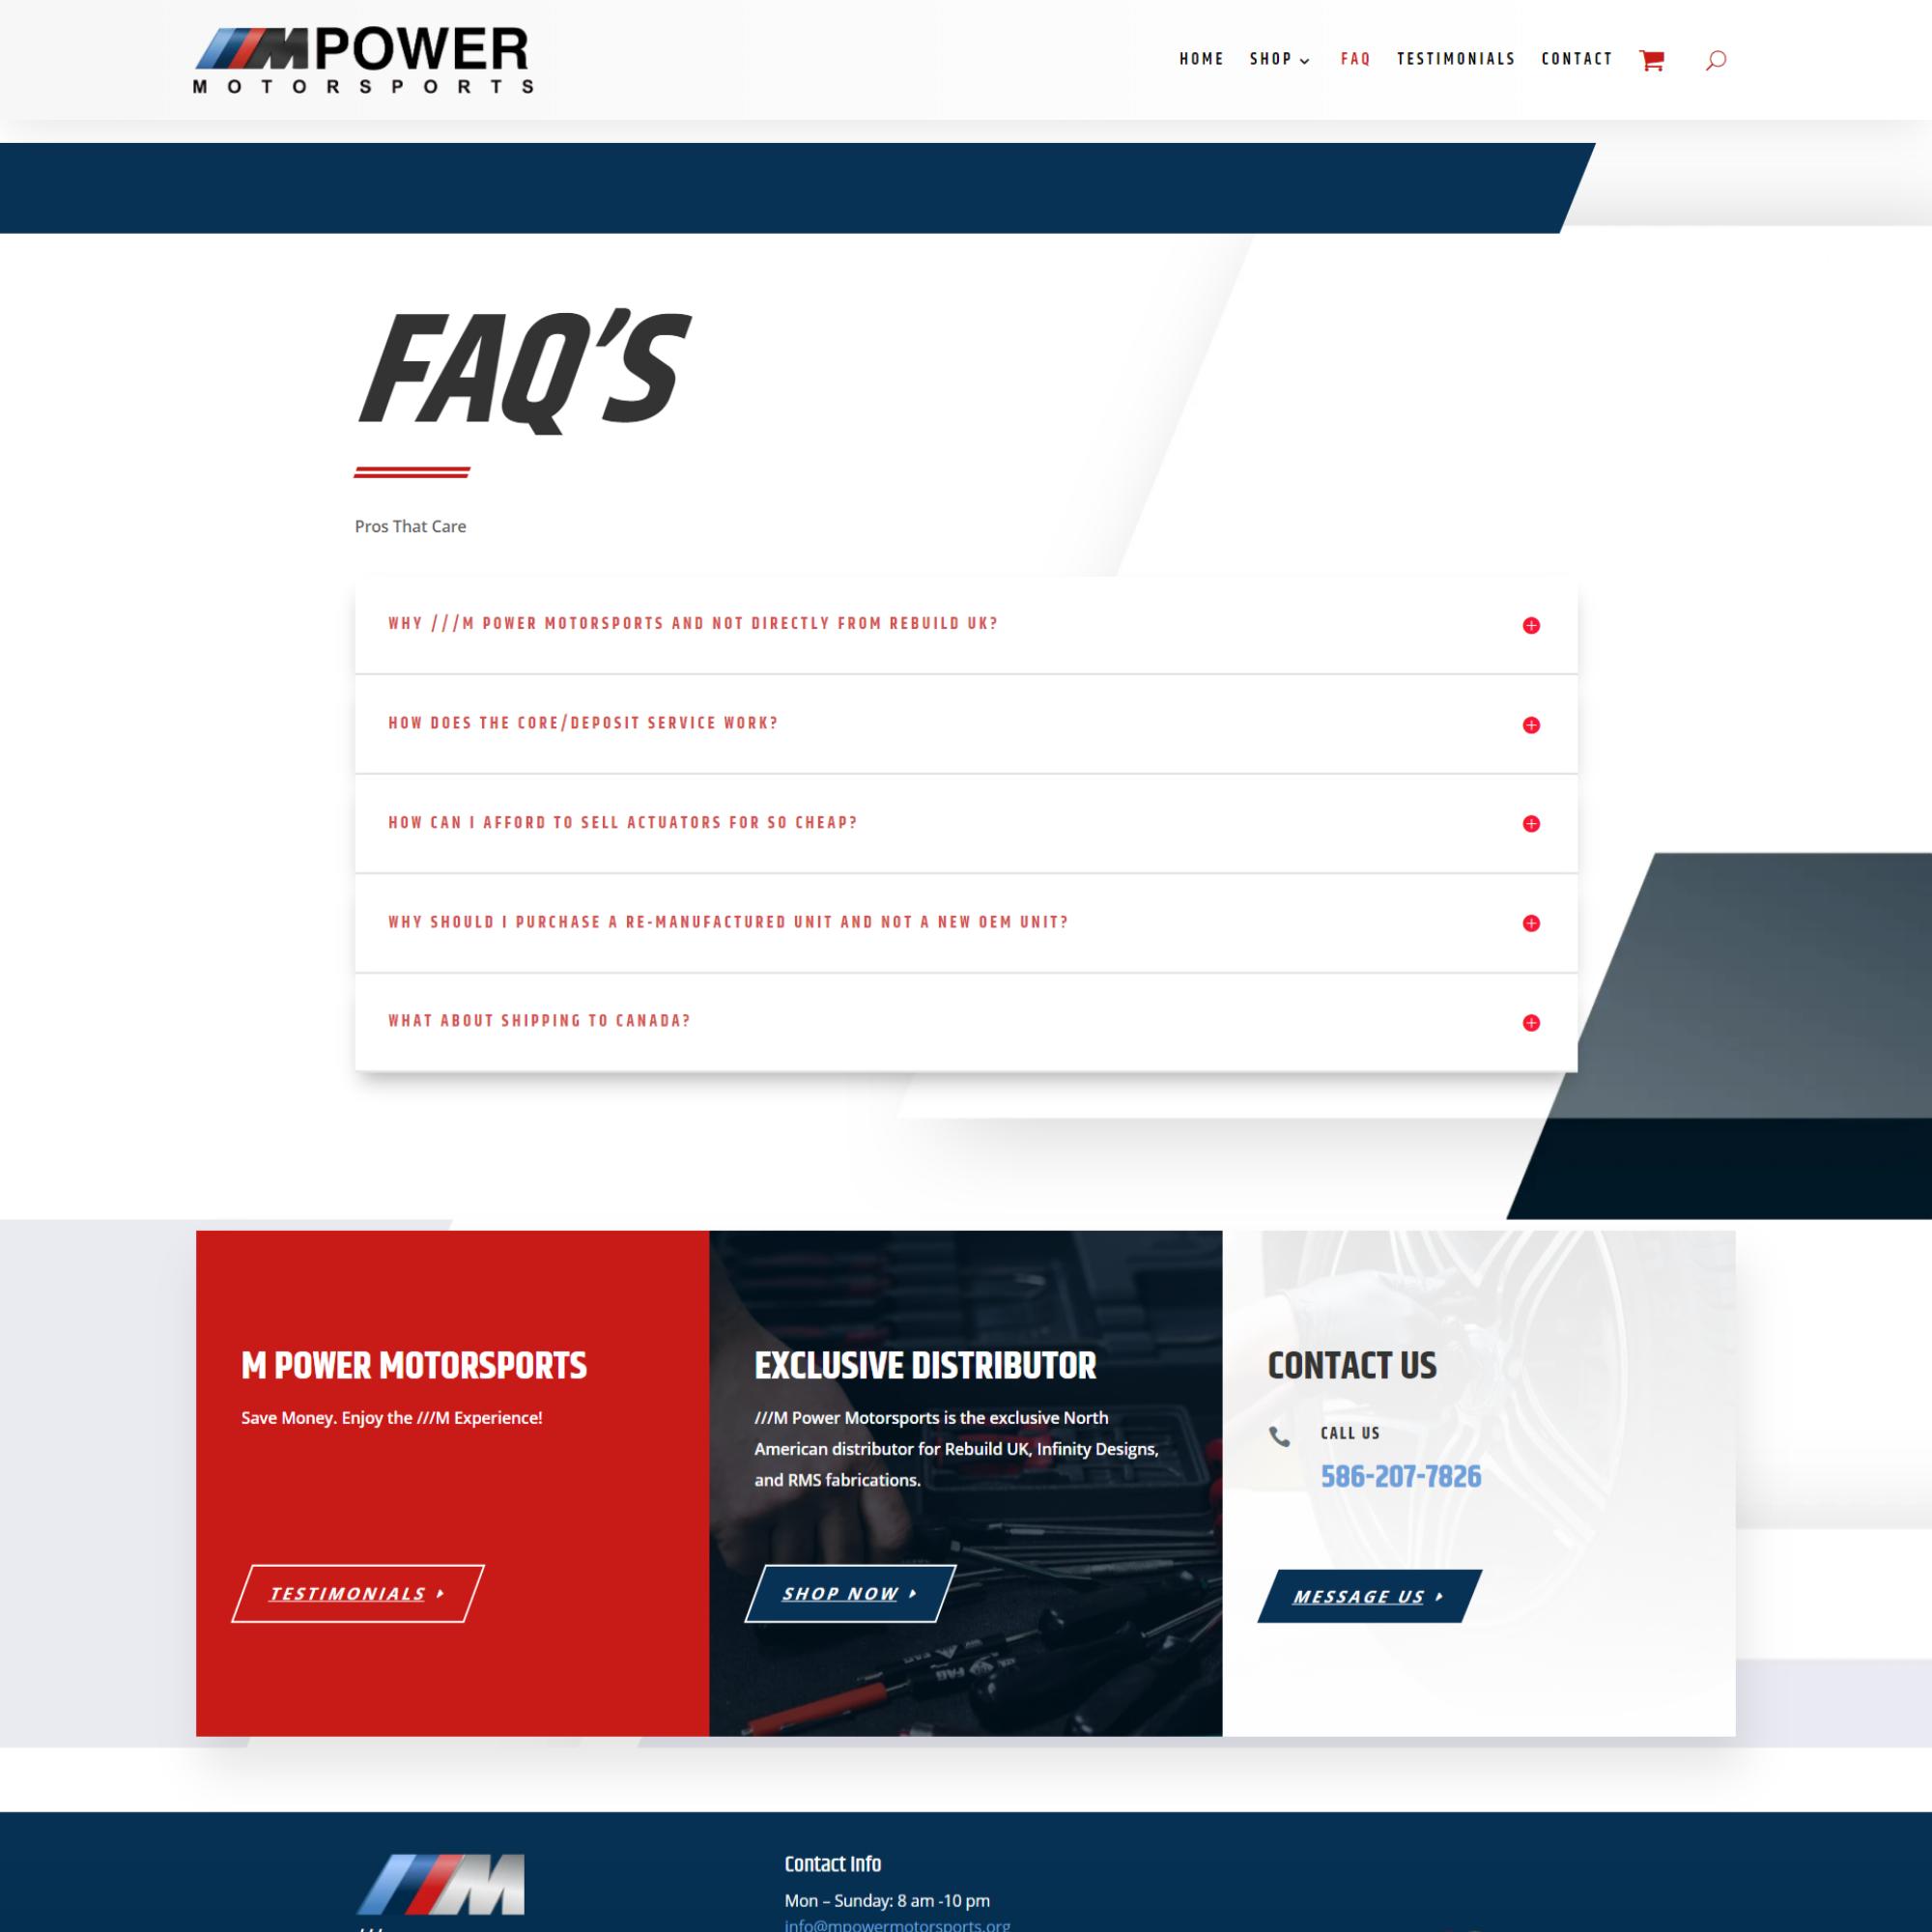 mpowermotorsports FAQ's